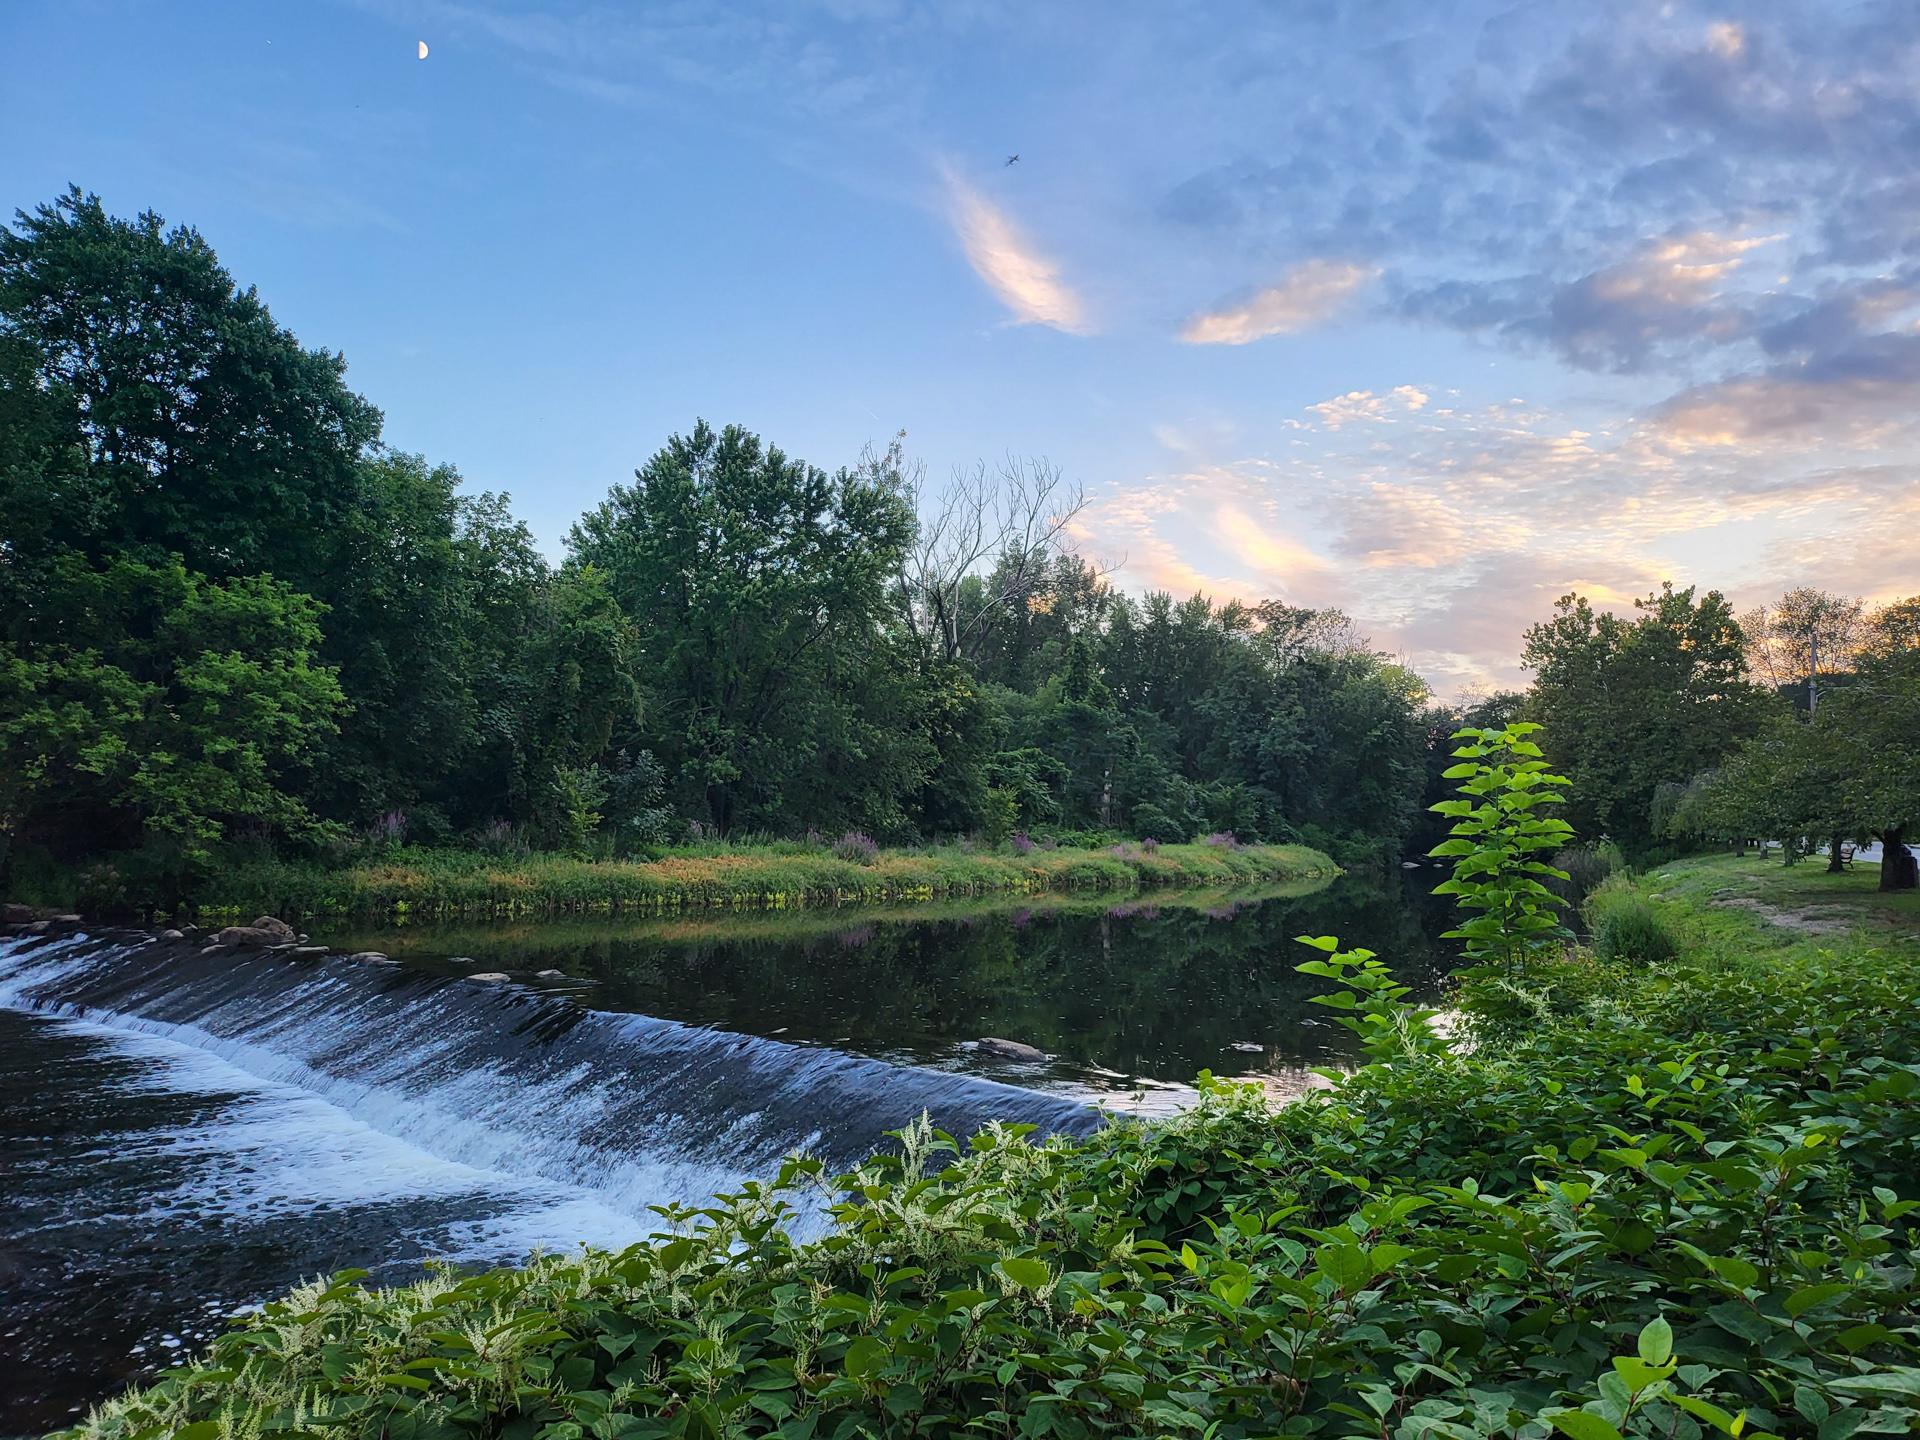 Samsung Galaxy Z Fold 3 photo sample falls with sunset